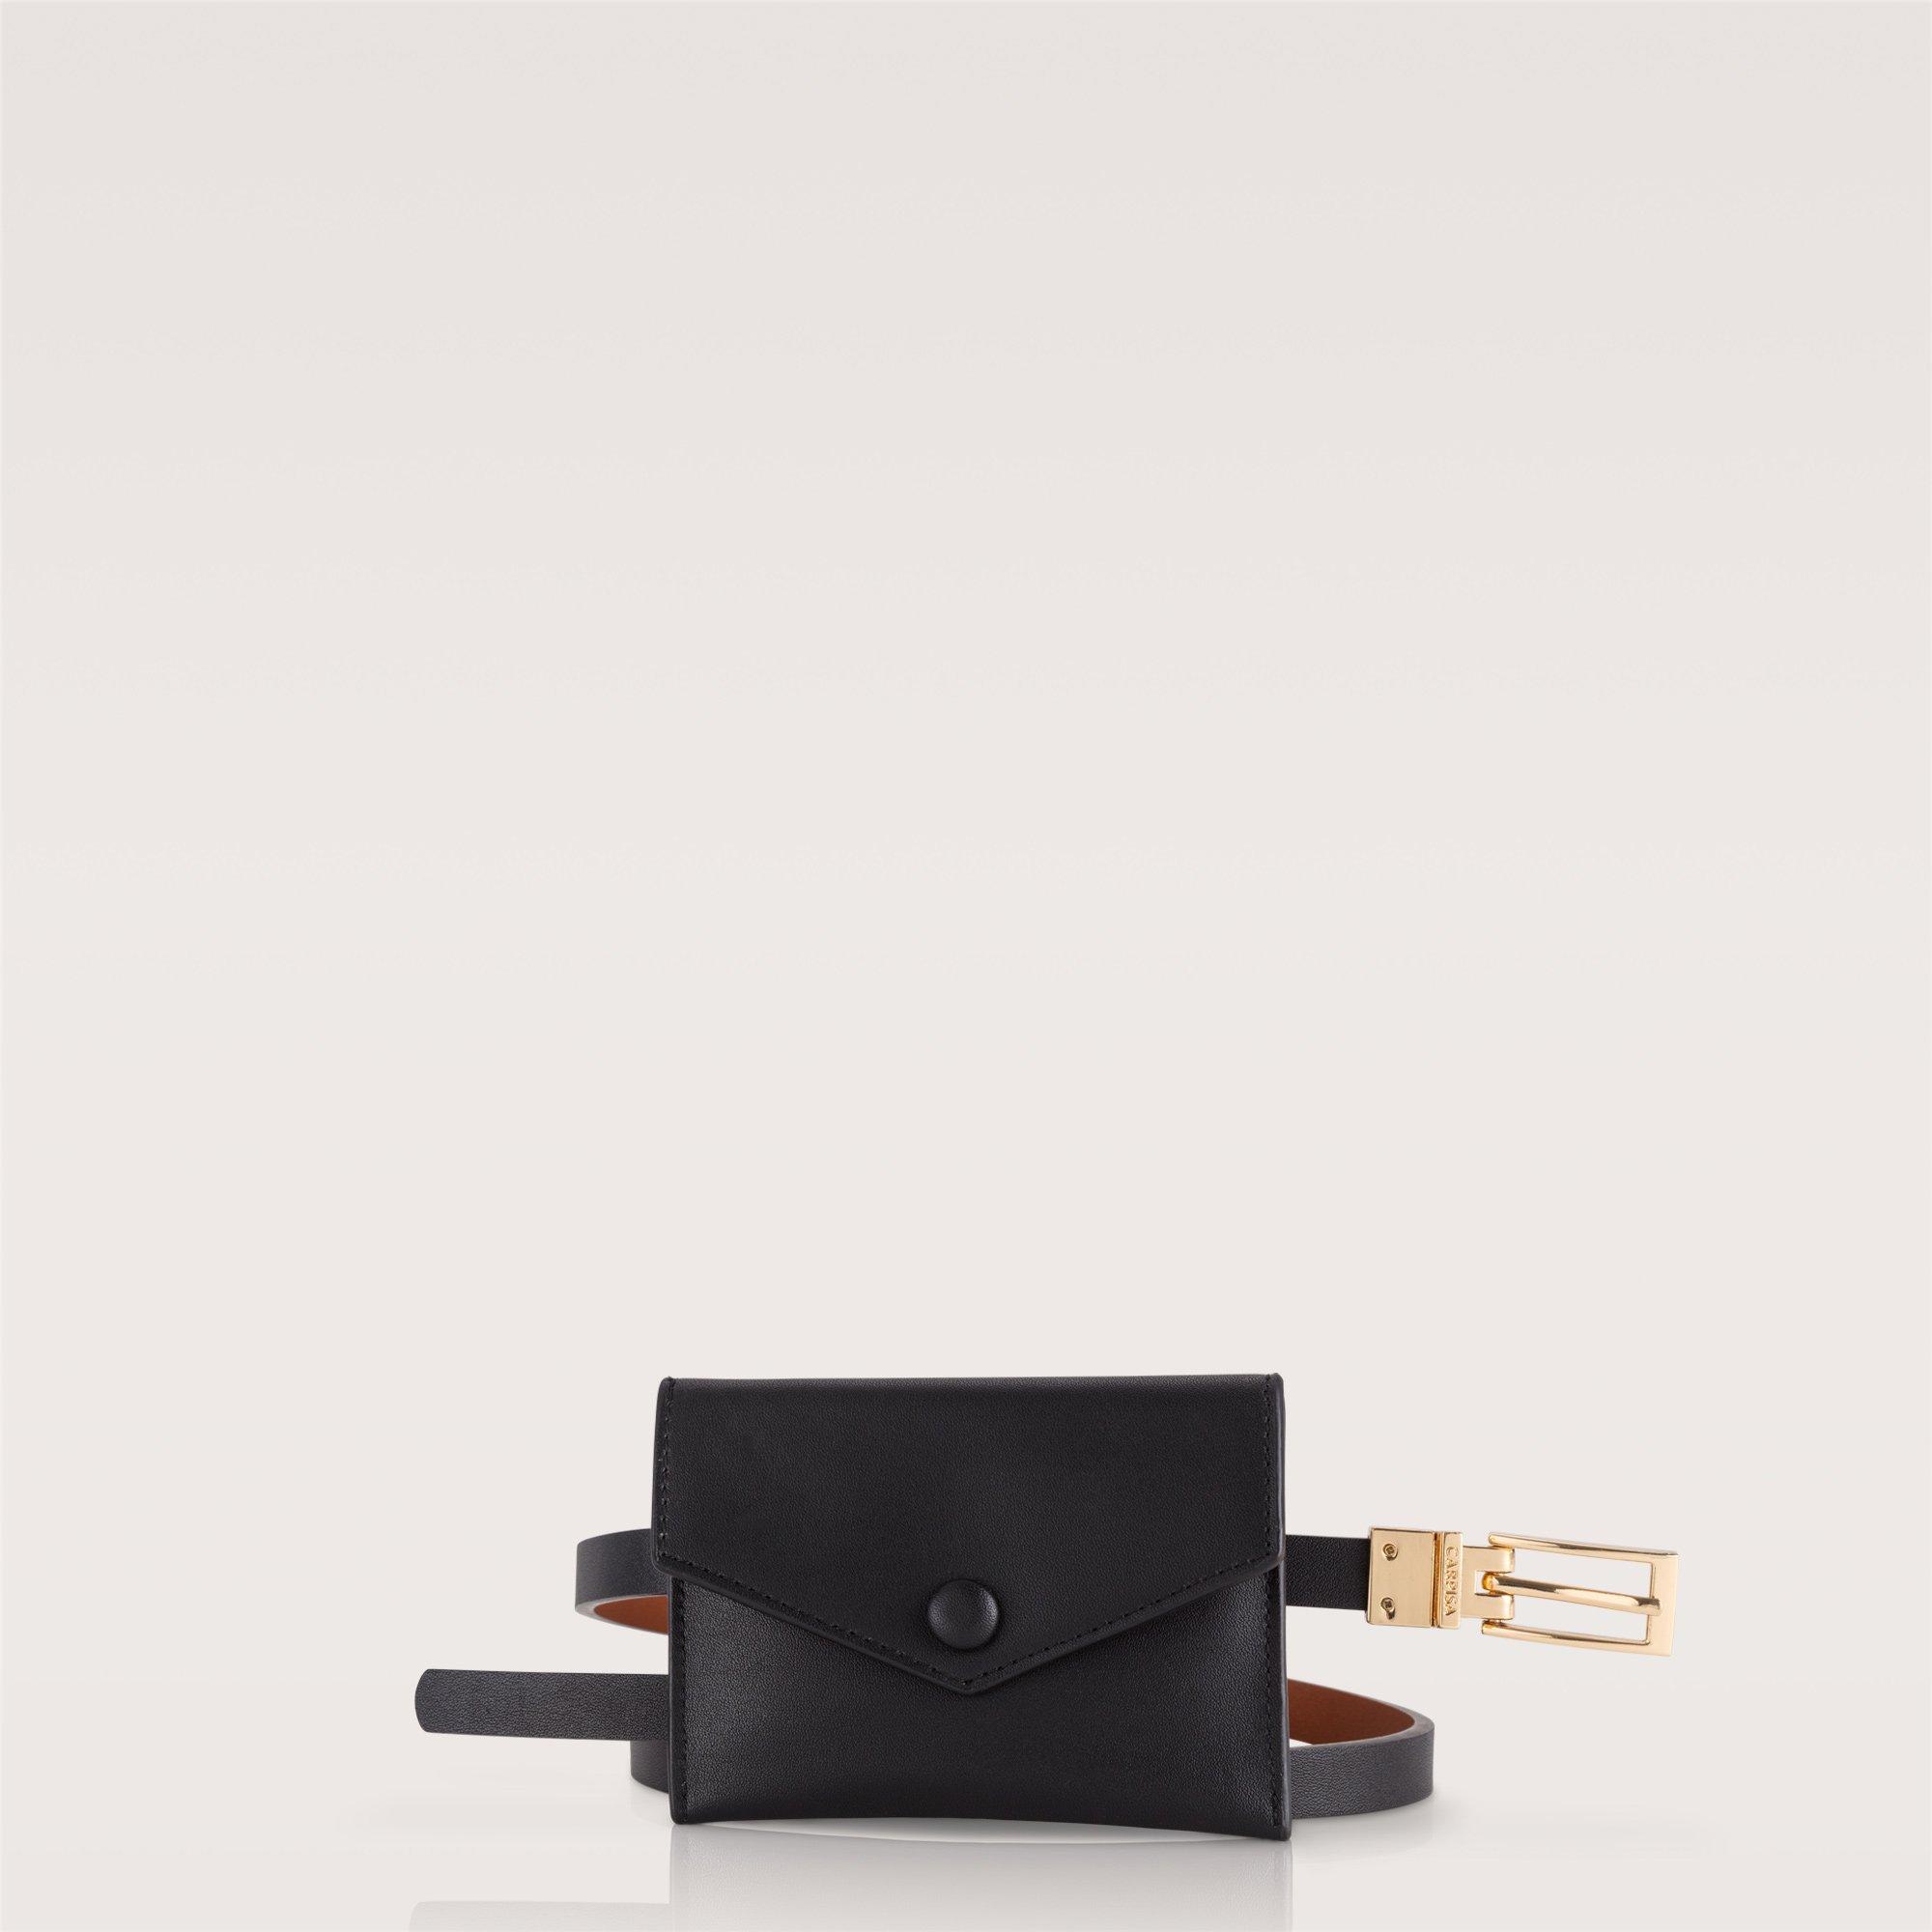 Wallet belt - Geraneo priced at INR 1499